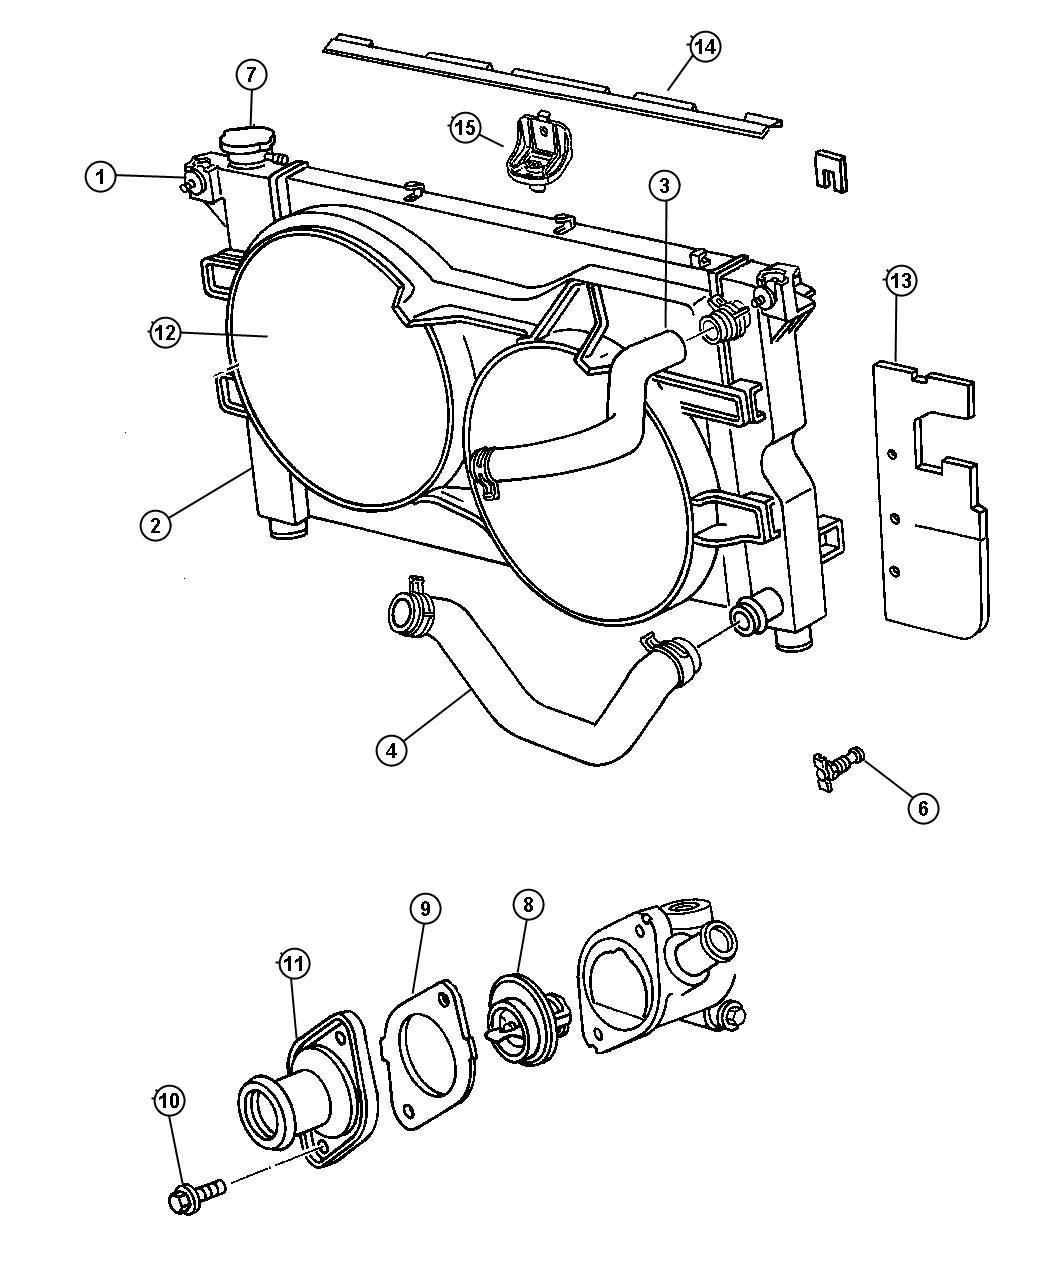 Jeep Liberty Engine Diagram